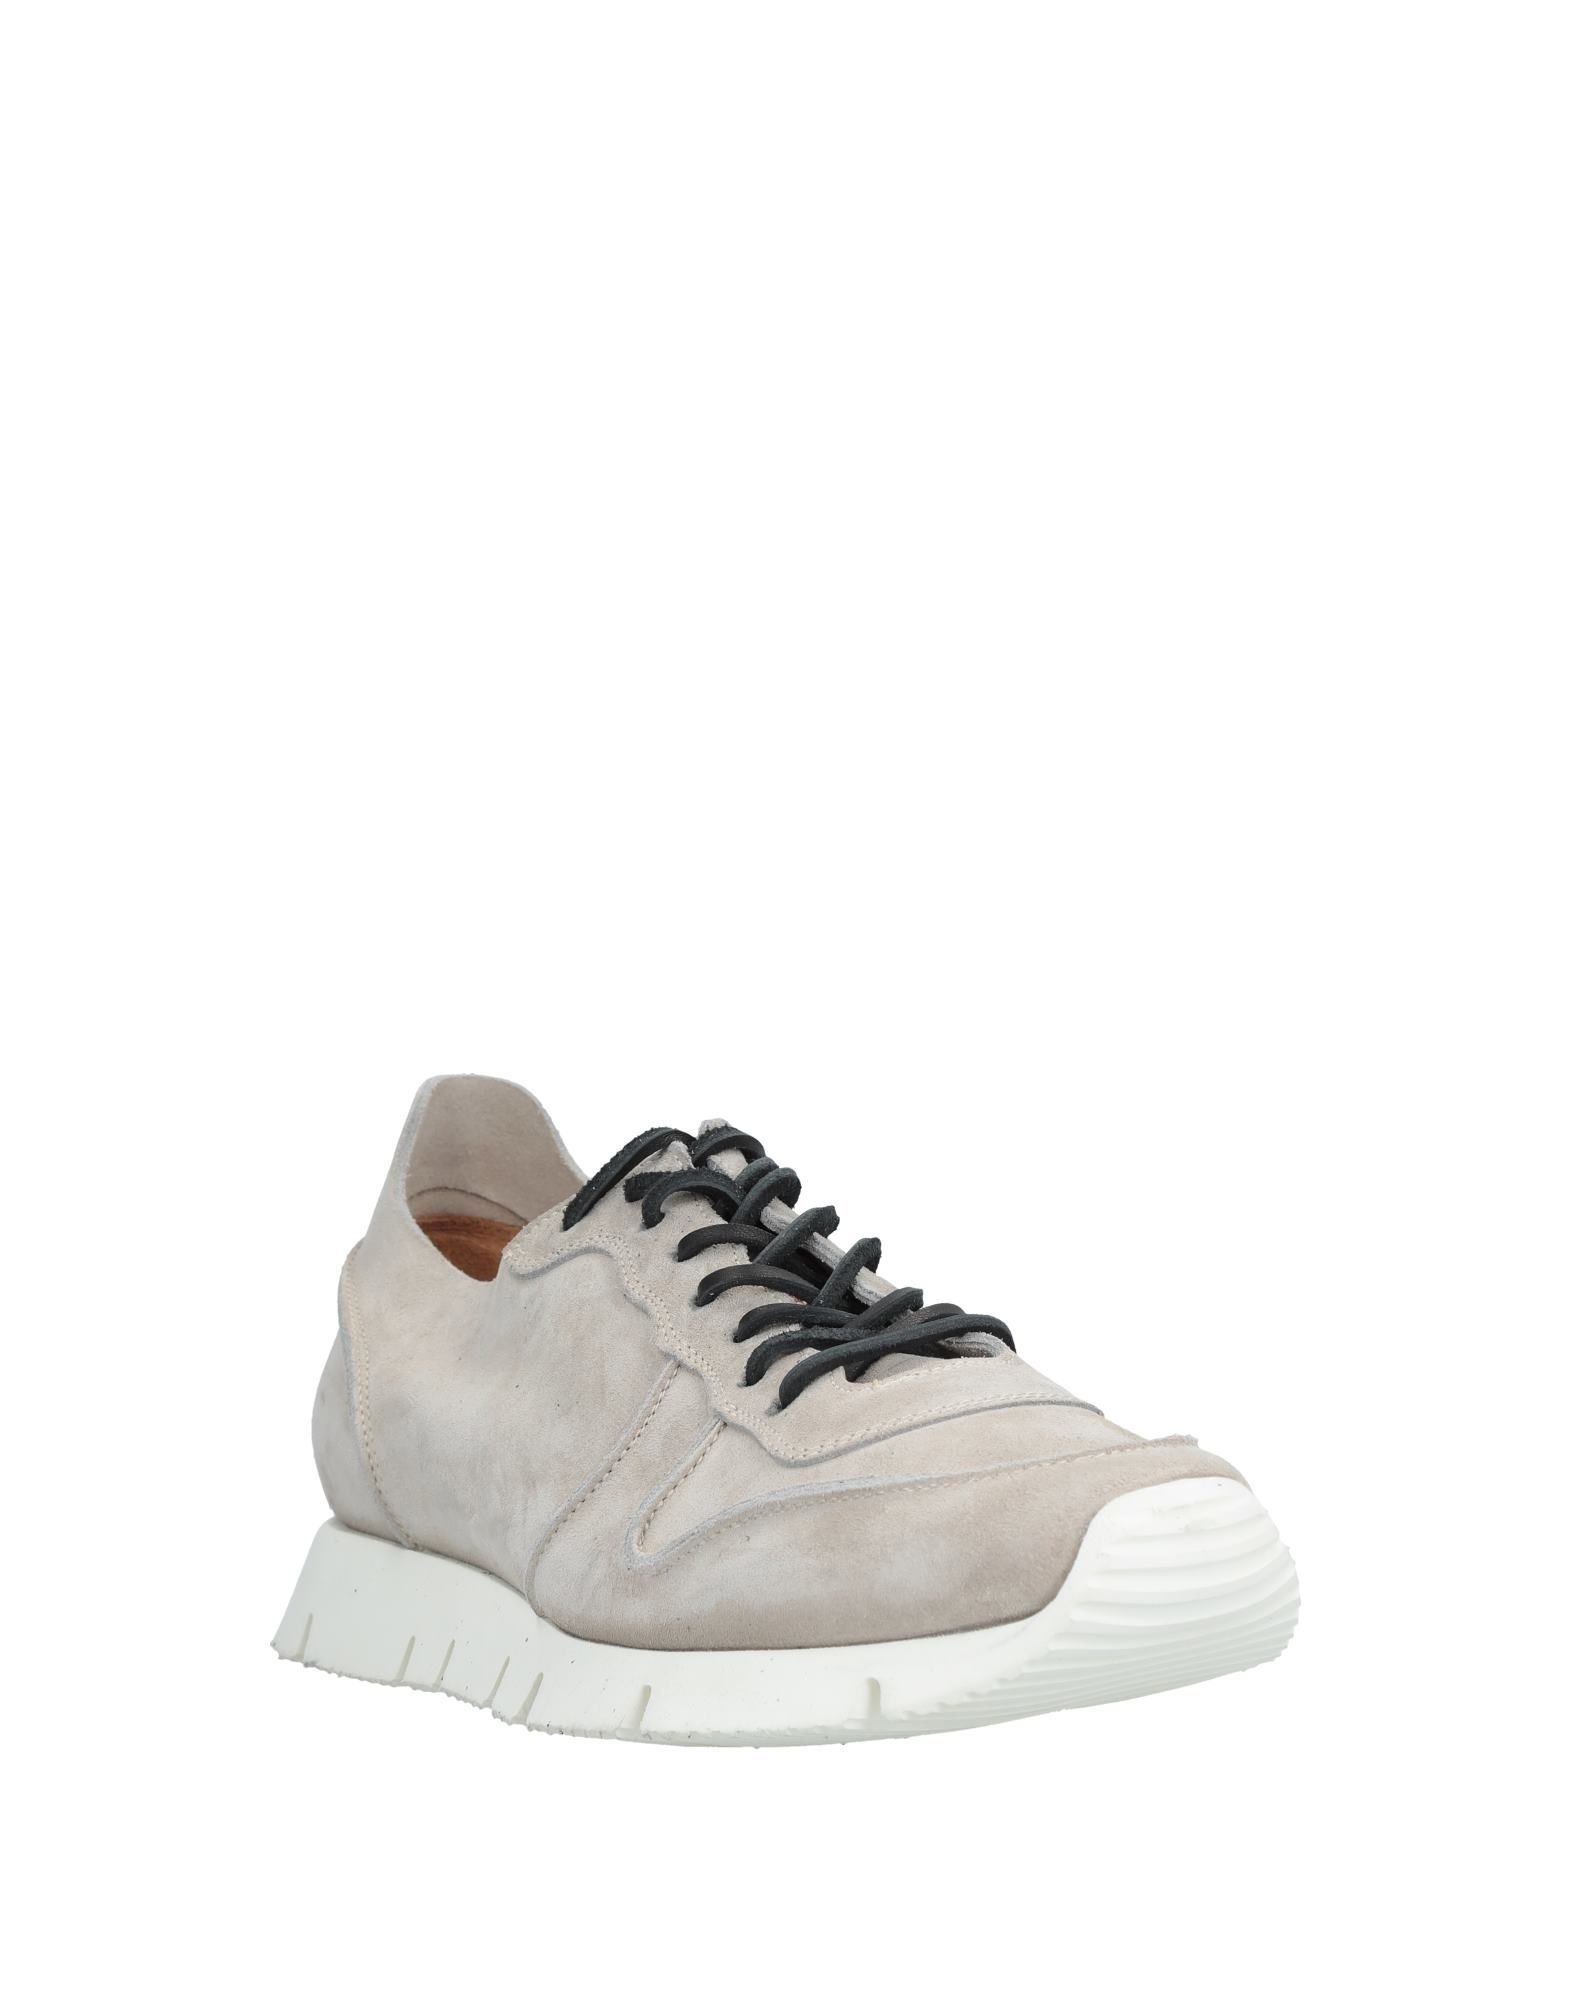 Buttero® Gute Sneakers Herren  11316625TK Gute Buttero® Qualität beliebte Schuhe e137fa